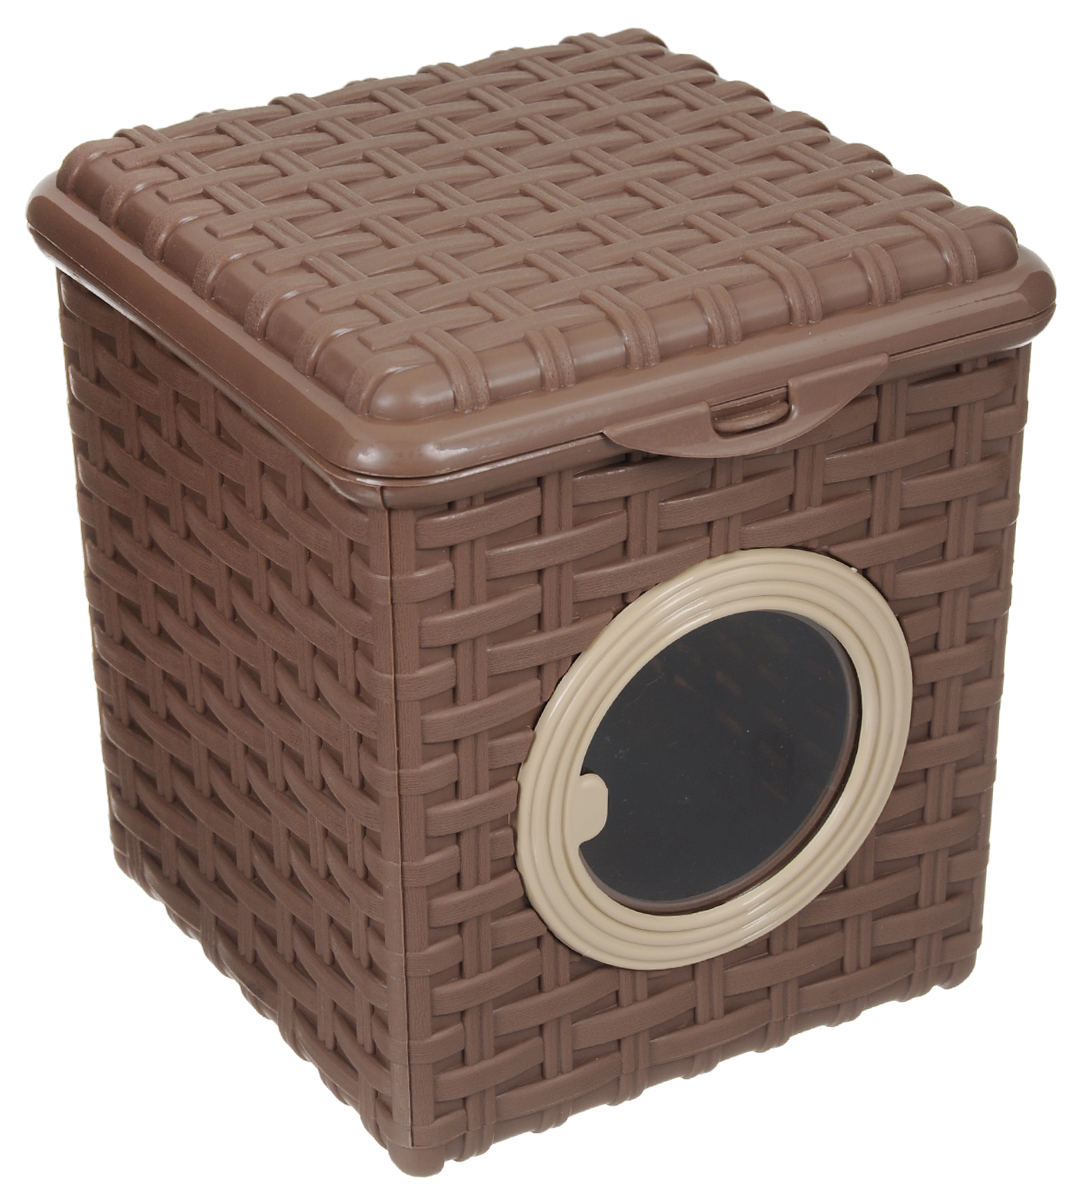 Контейнер для мелочей Violet, цвет: какао, 18 х 18,5 х 14,5 см контейнер для мелочей hobby